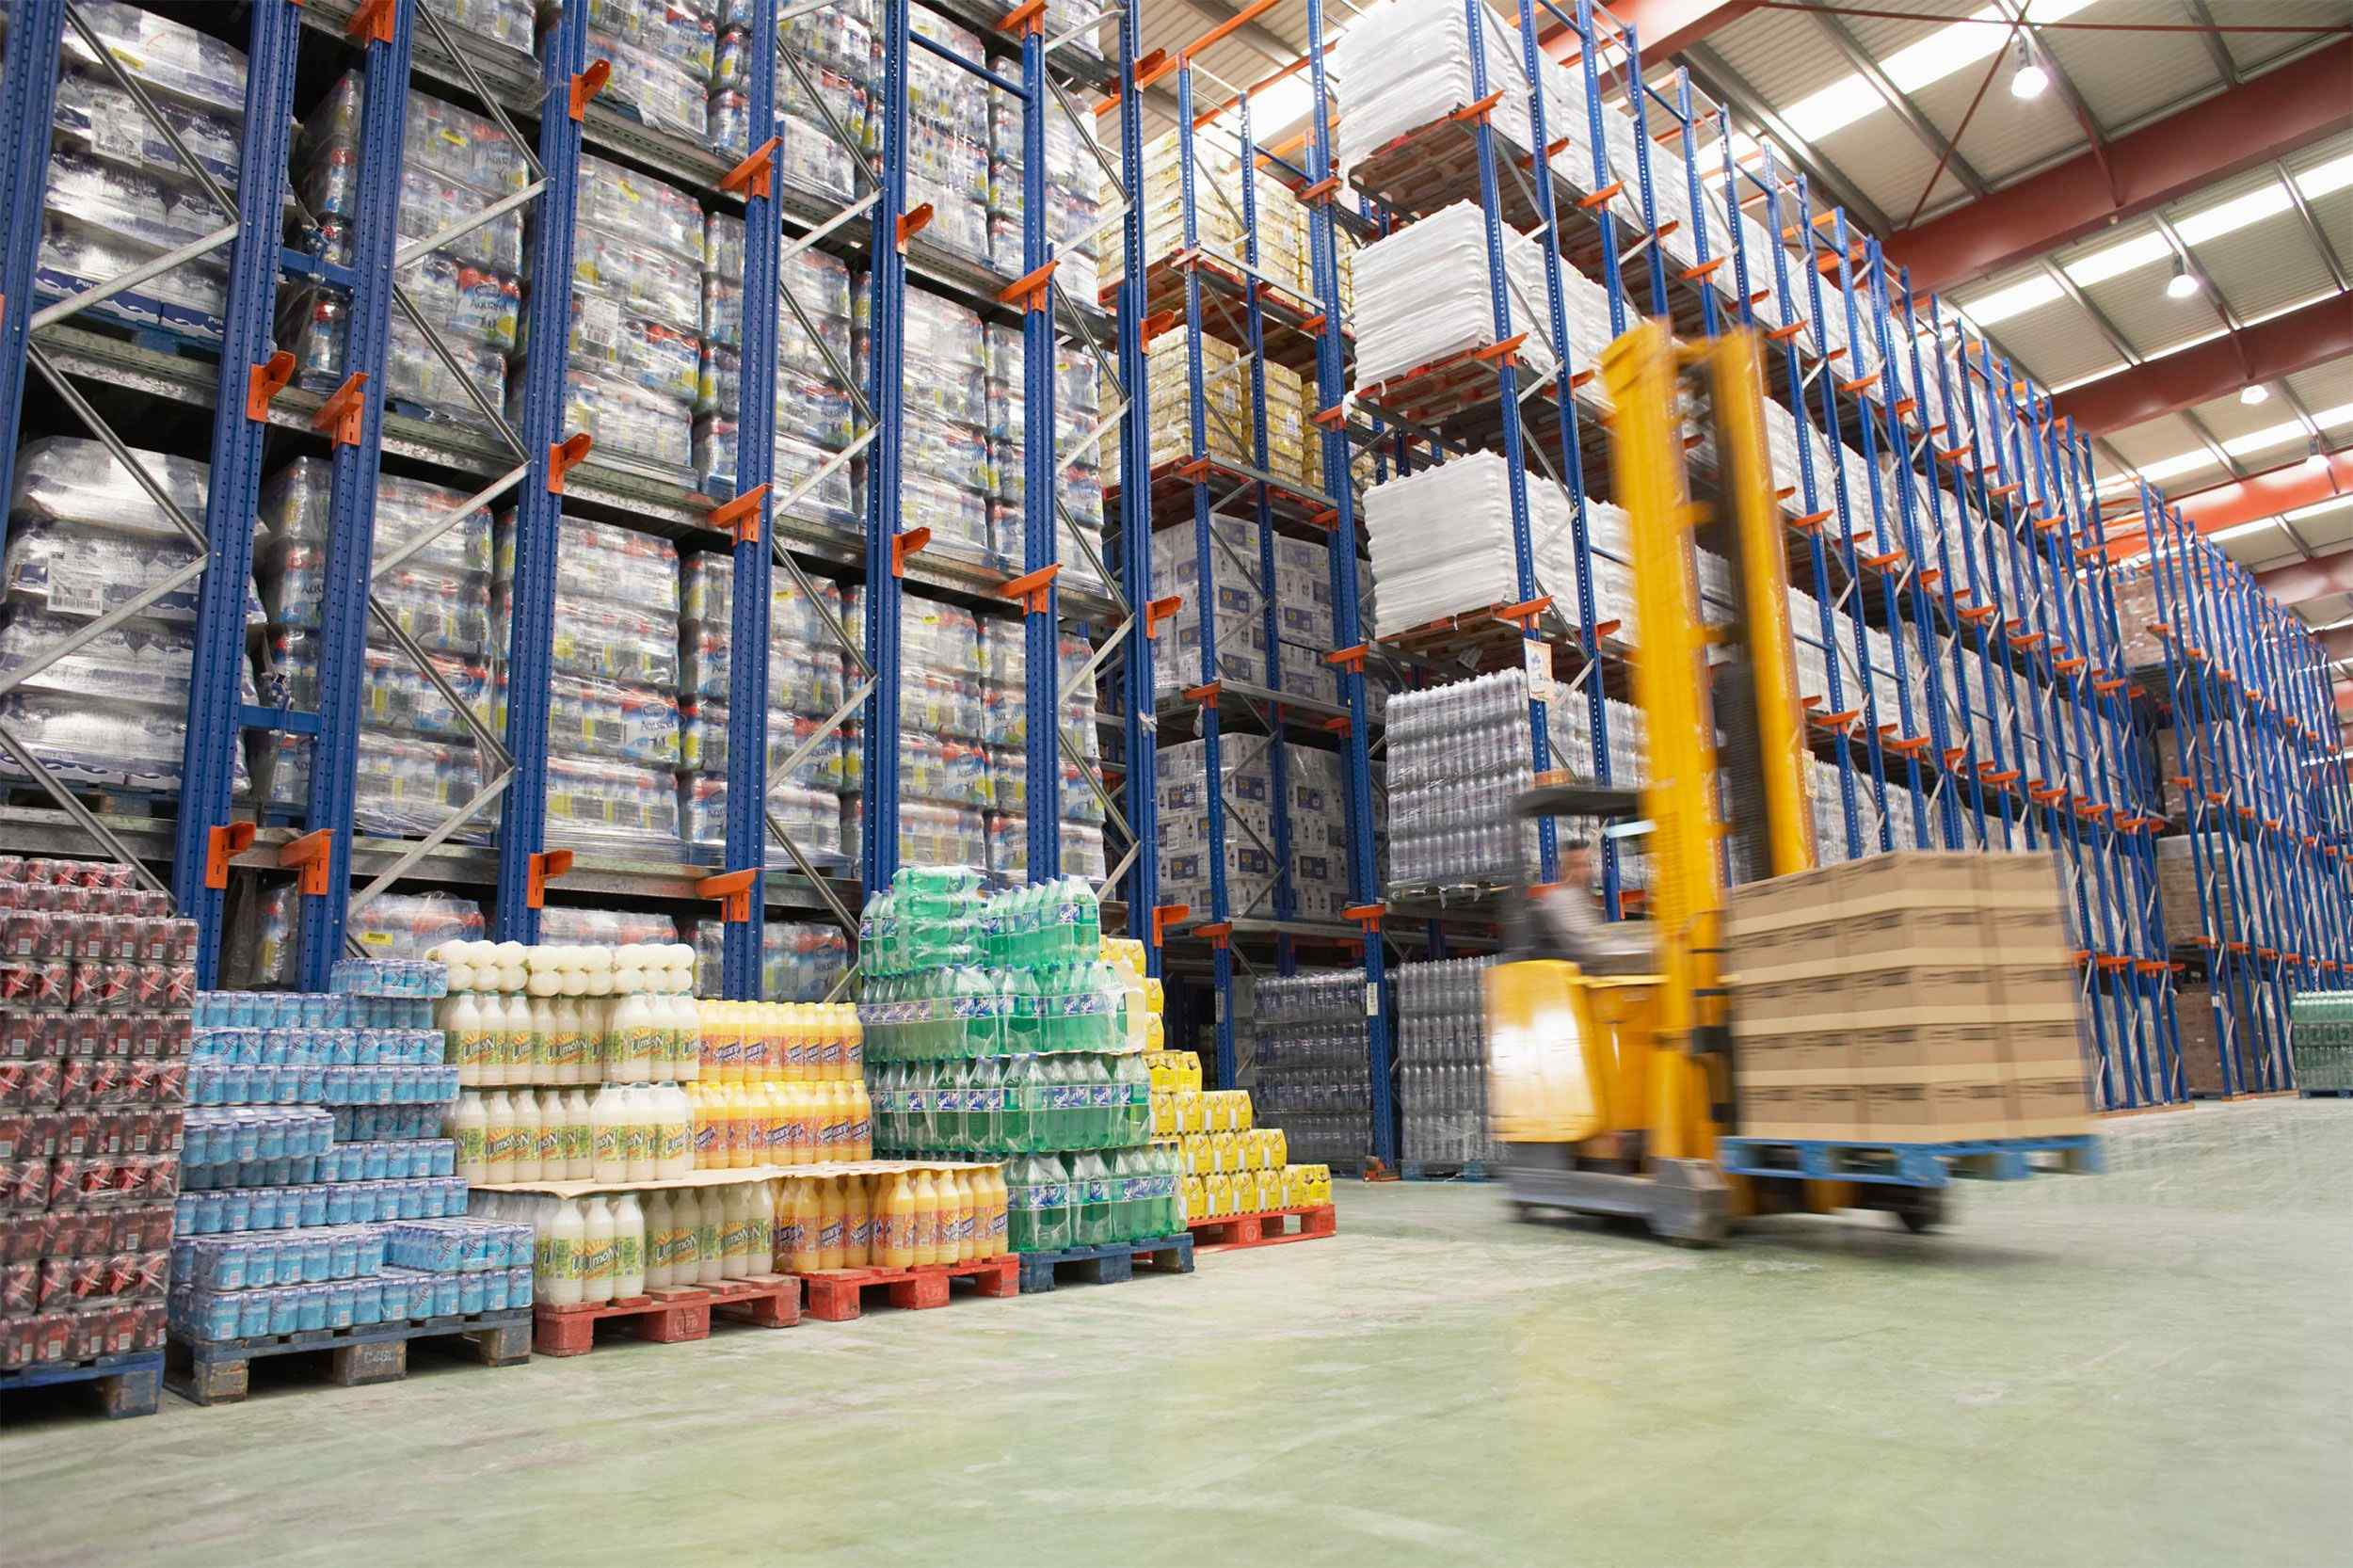 https://gblc-ht.com/wp-content/uploads/2015/09/Warehouse-and-lifter.jpg